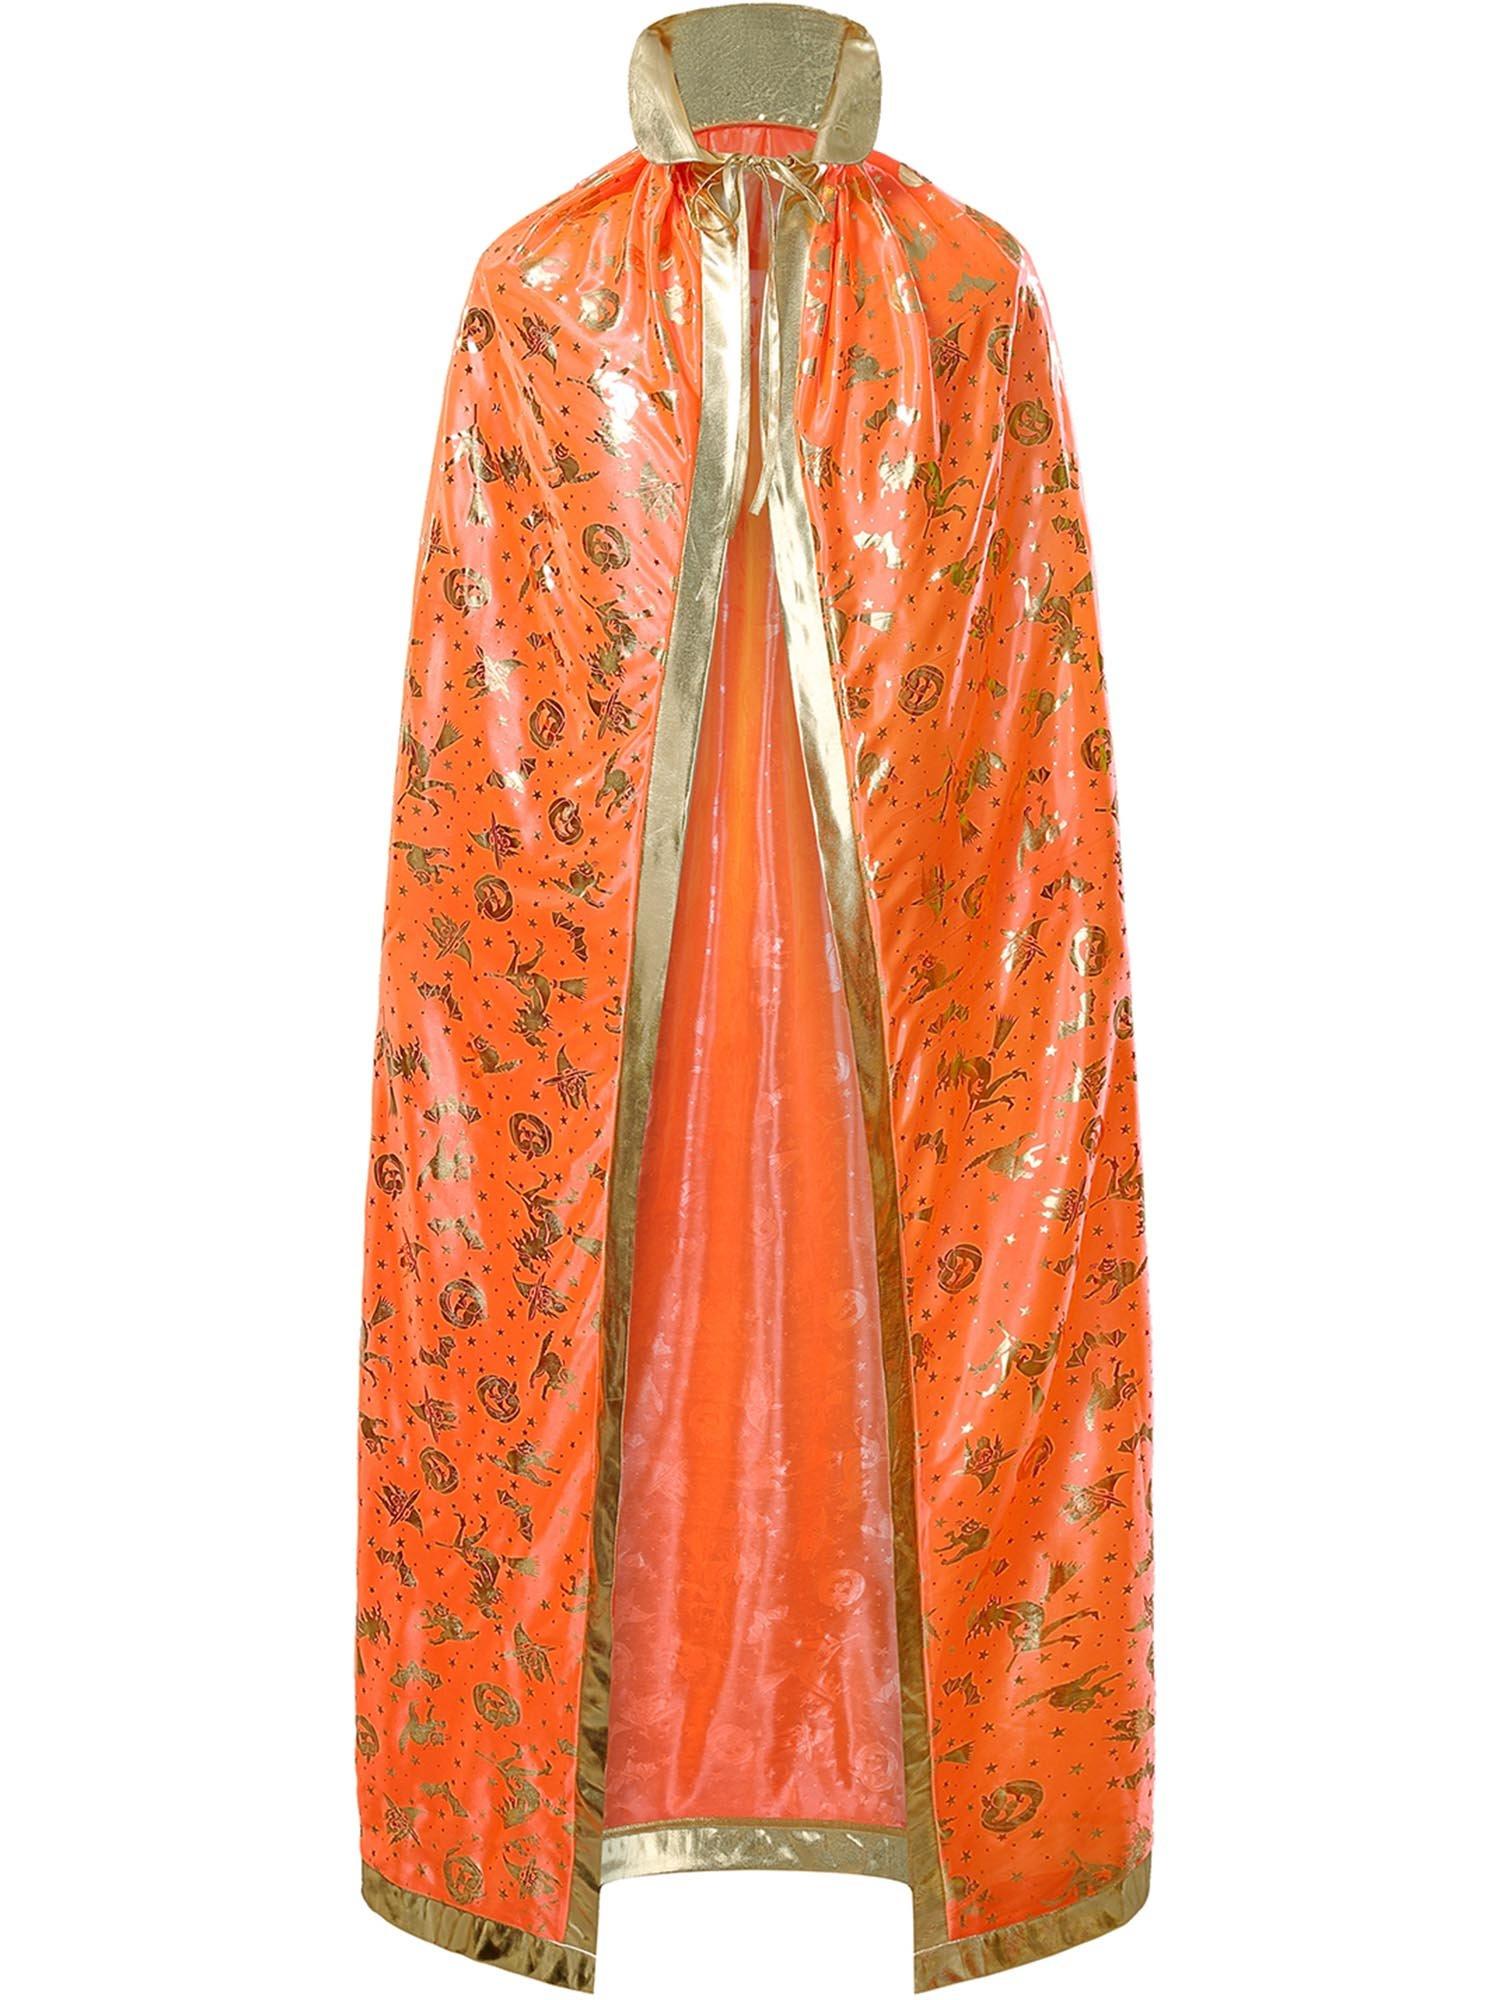 KIRA Adult Sequin Cape Costumes Parties Long Costume Cape 17077-1